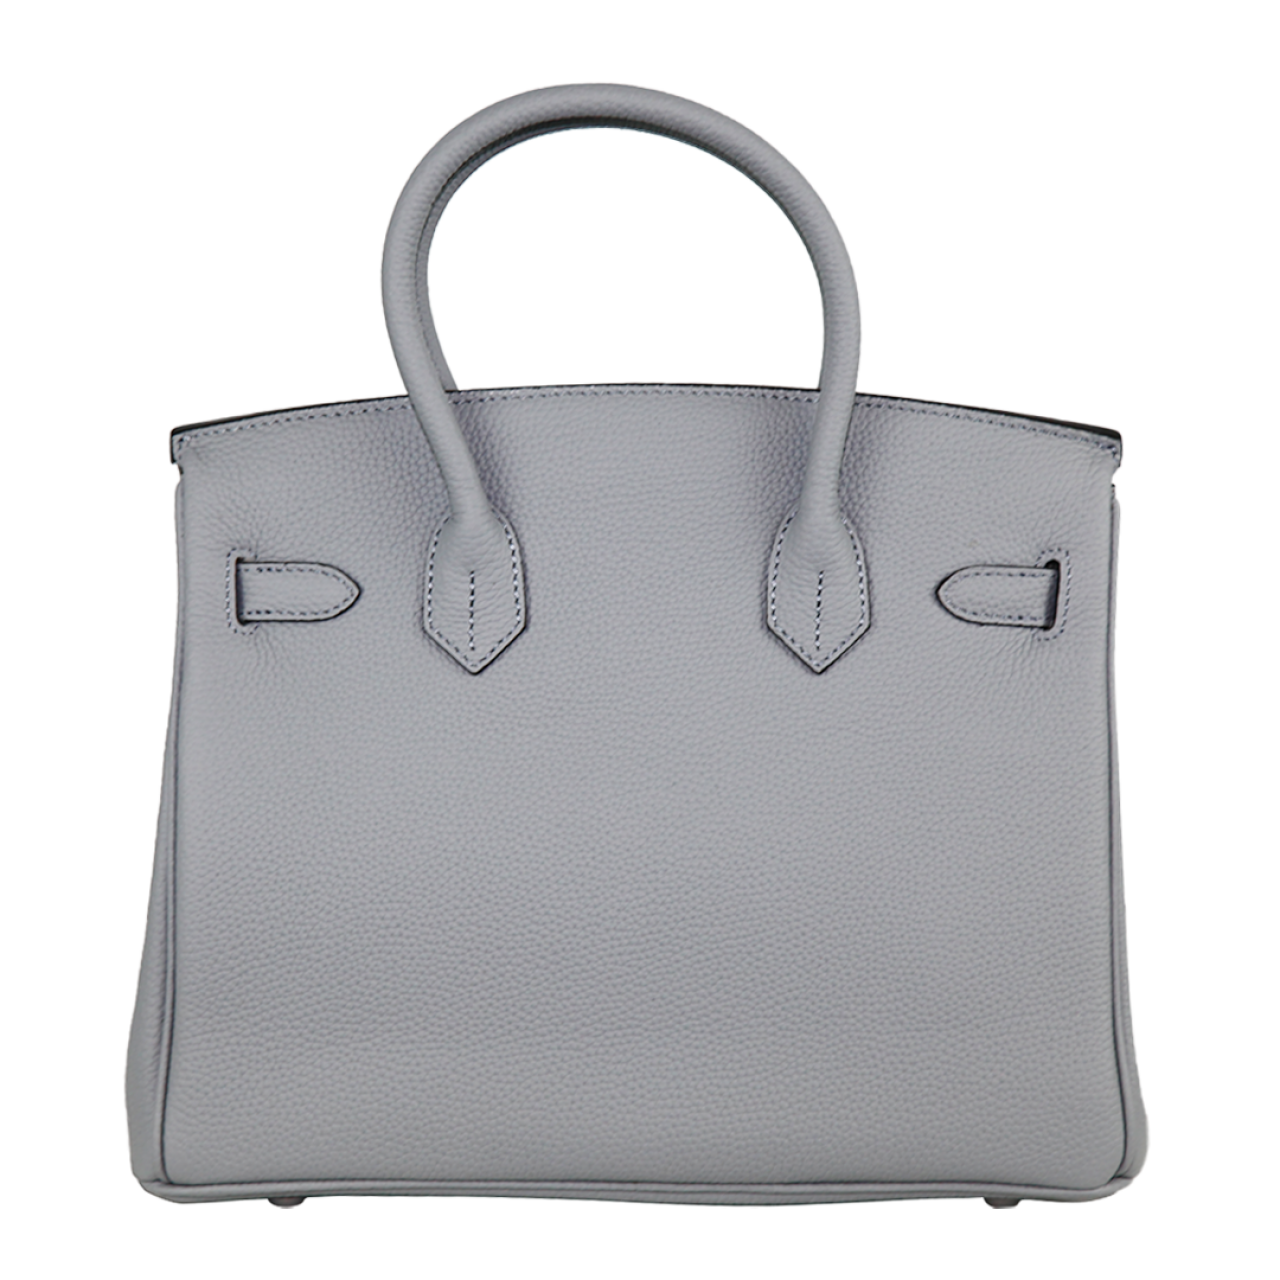 Zeekas Birkin Silver Hardware White New PU Leather Tote Bag